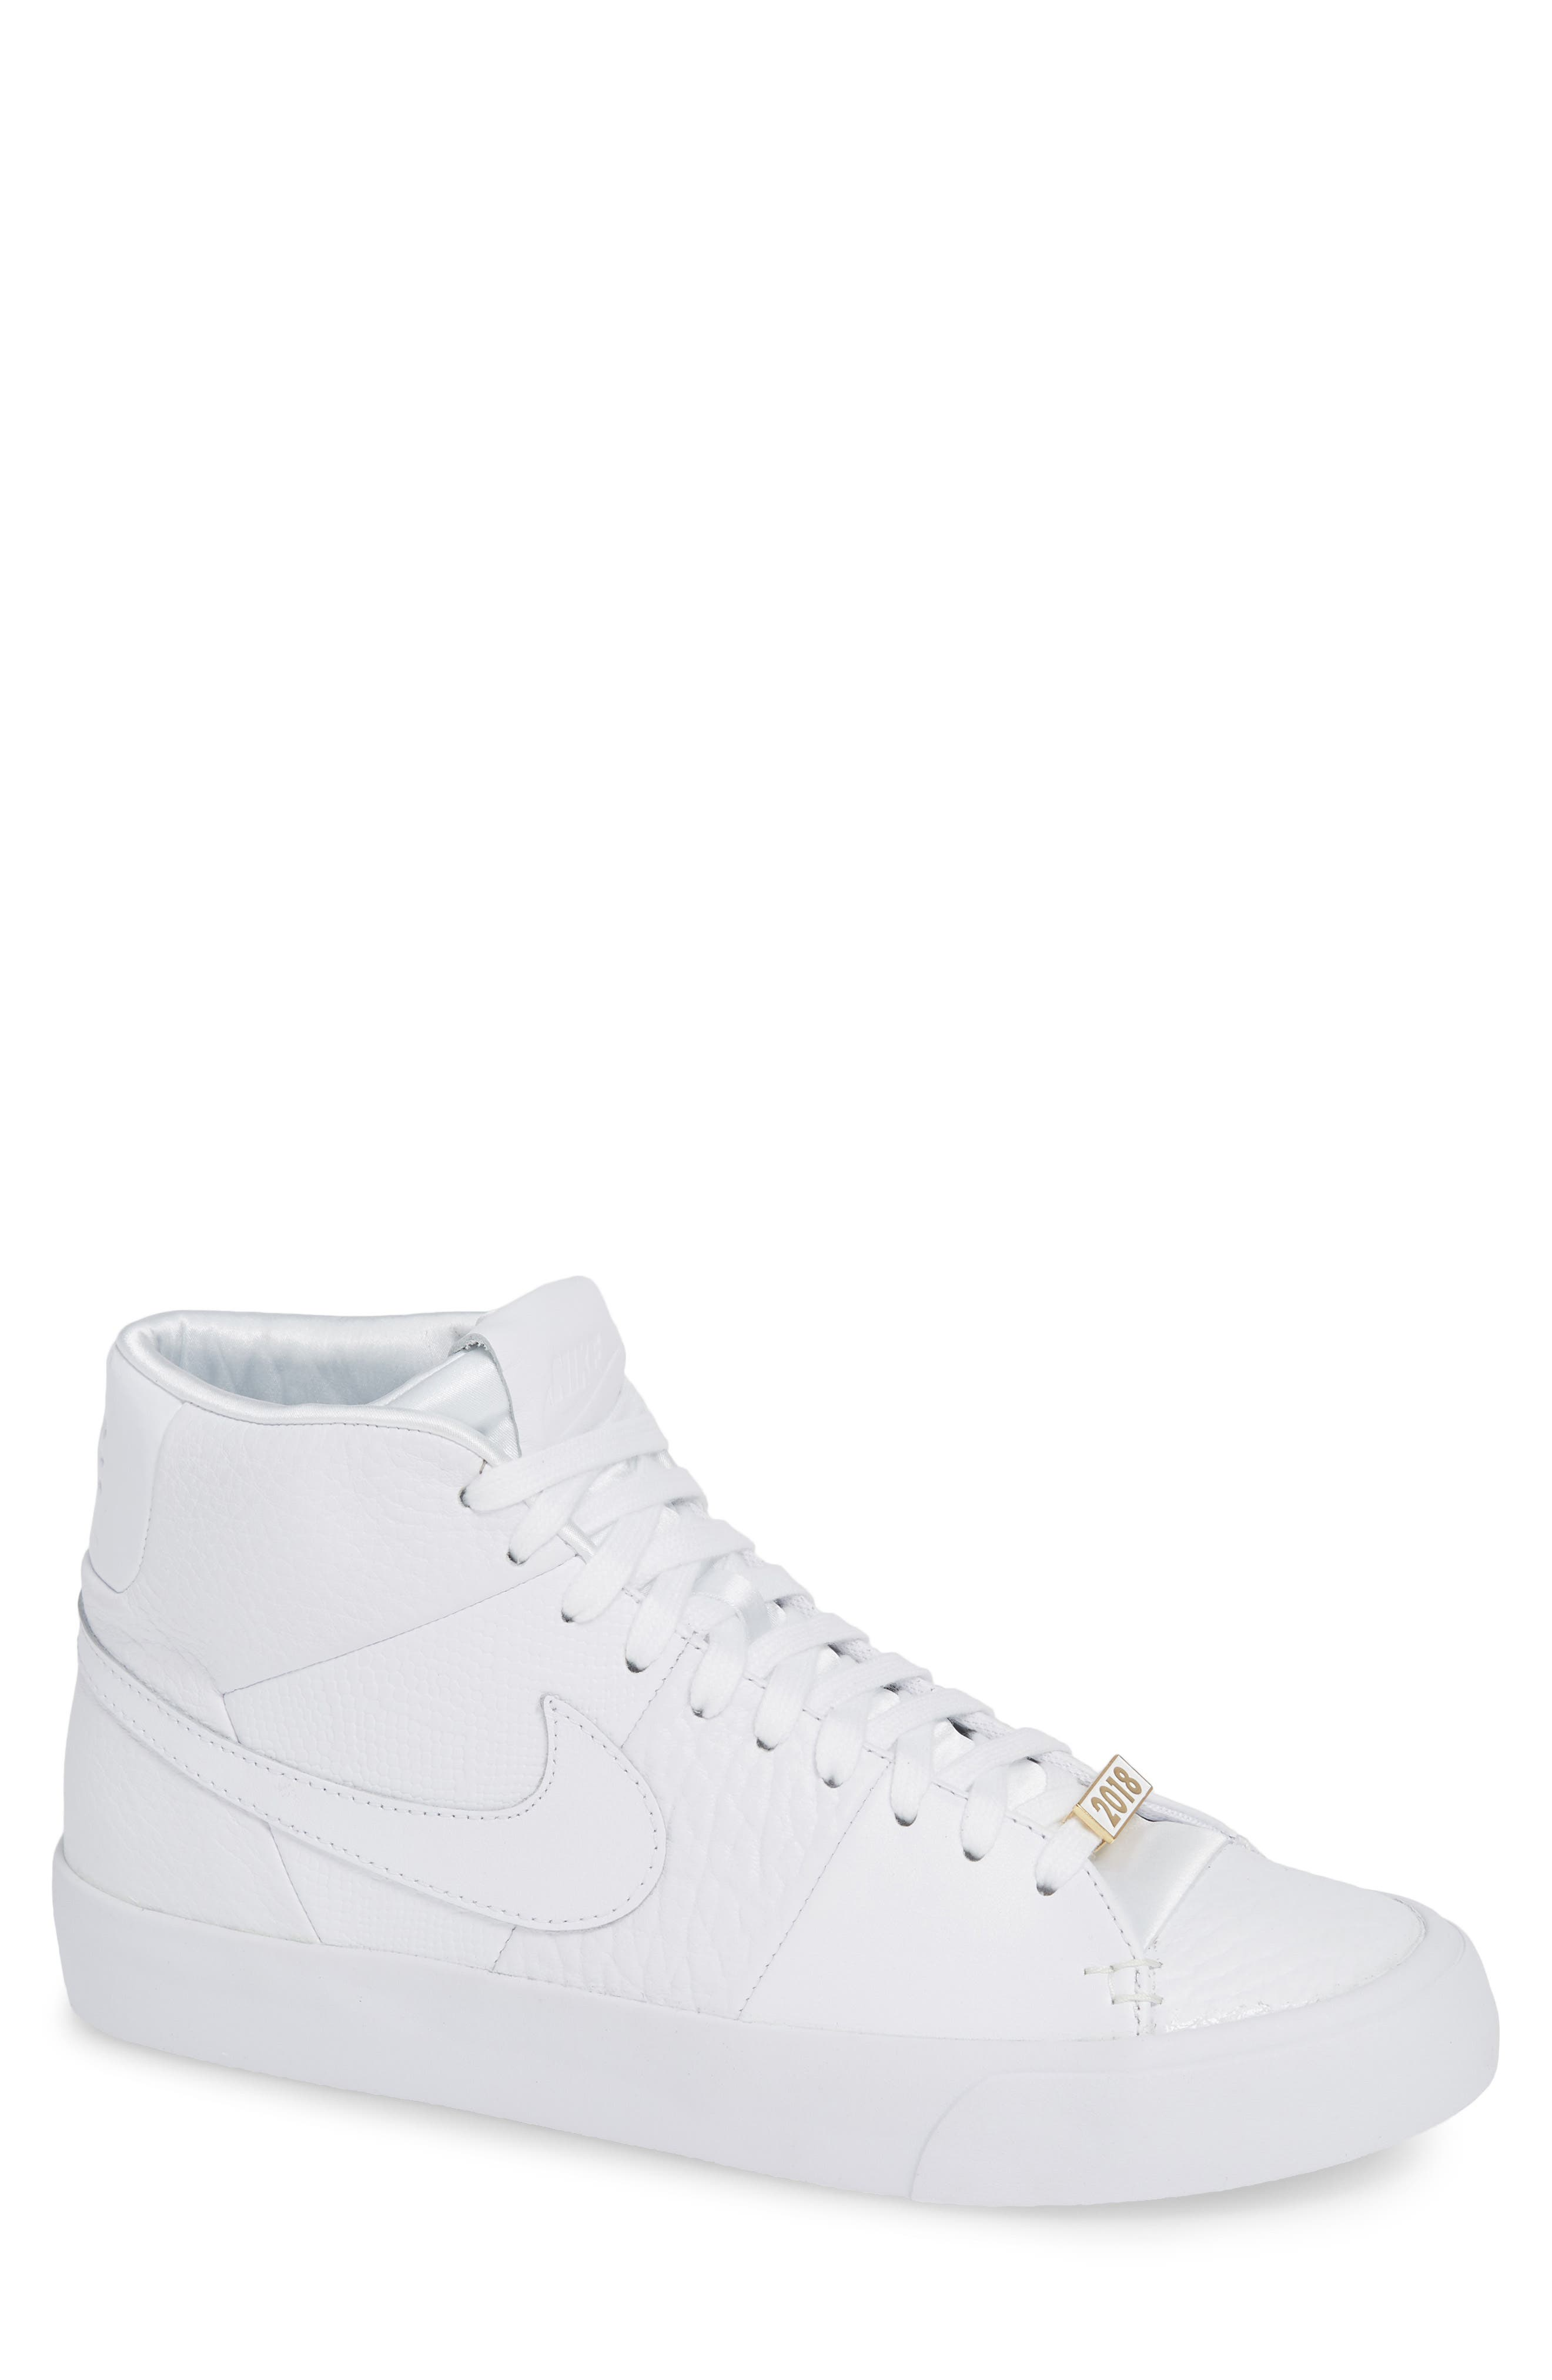 Blazer Royal QS High Top Sneaker,                         Main,                         color, WHITE/ WHITE/ WHITE